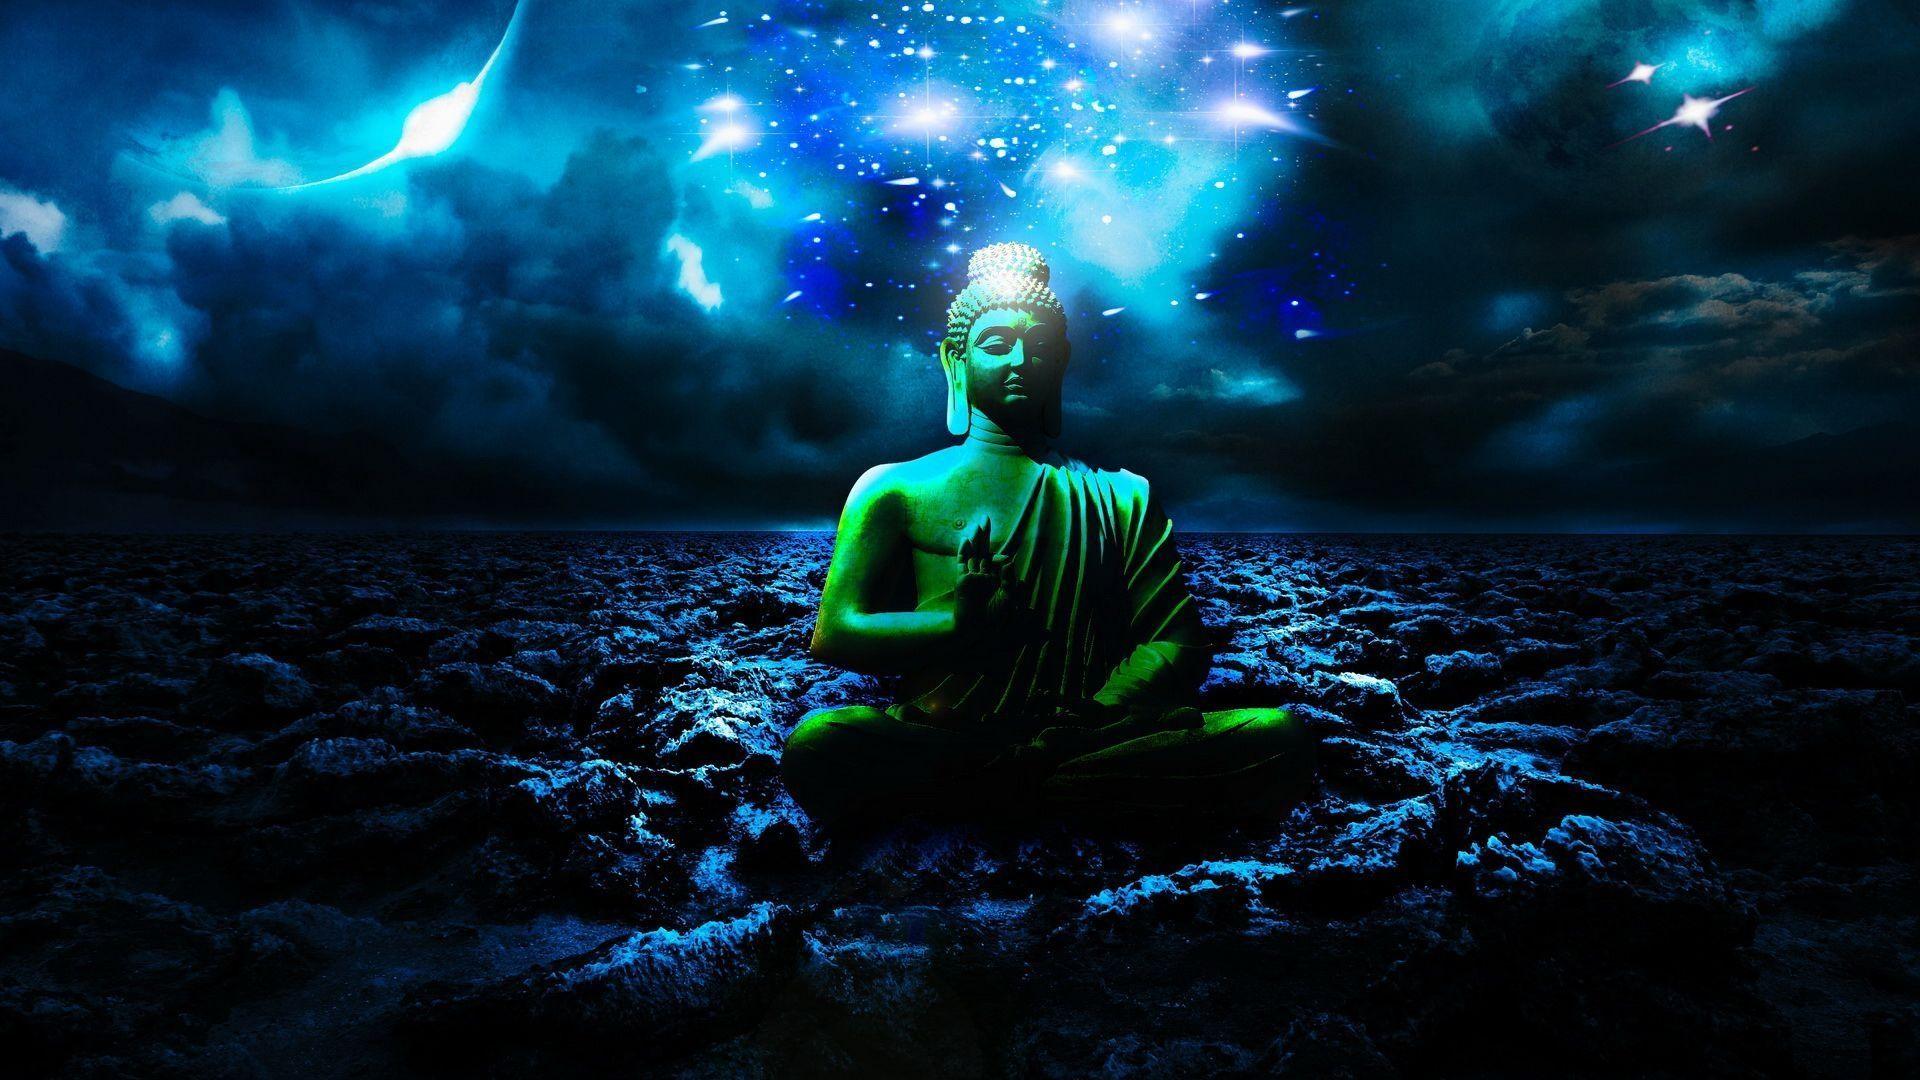 Buddha Wallpaper Buddha Buddha Meditation Buddha Zen